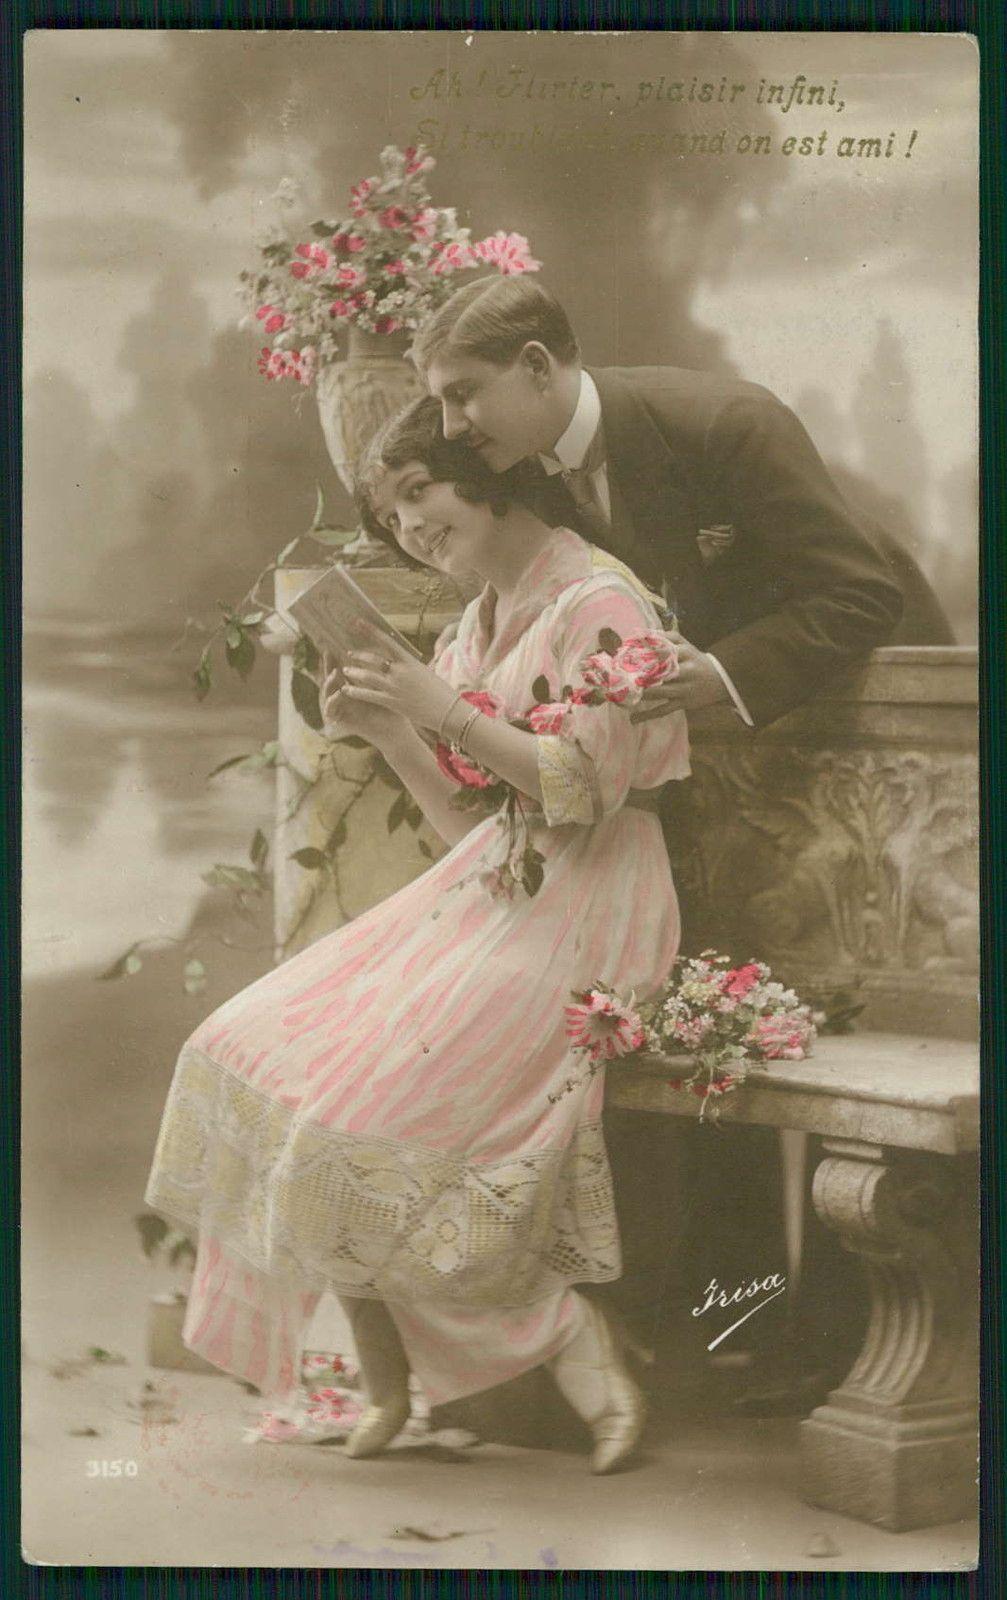 Edwardian Lady Love Romance Couple original vintage old